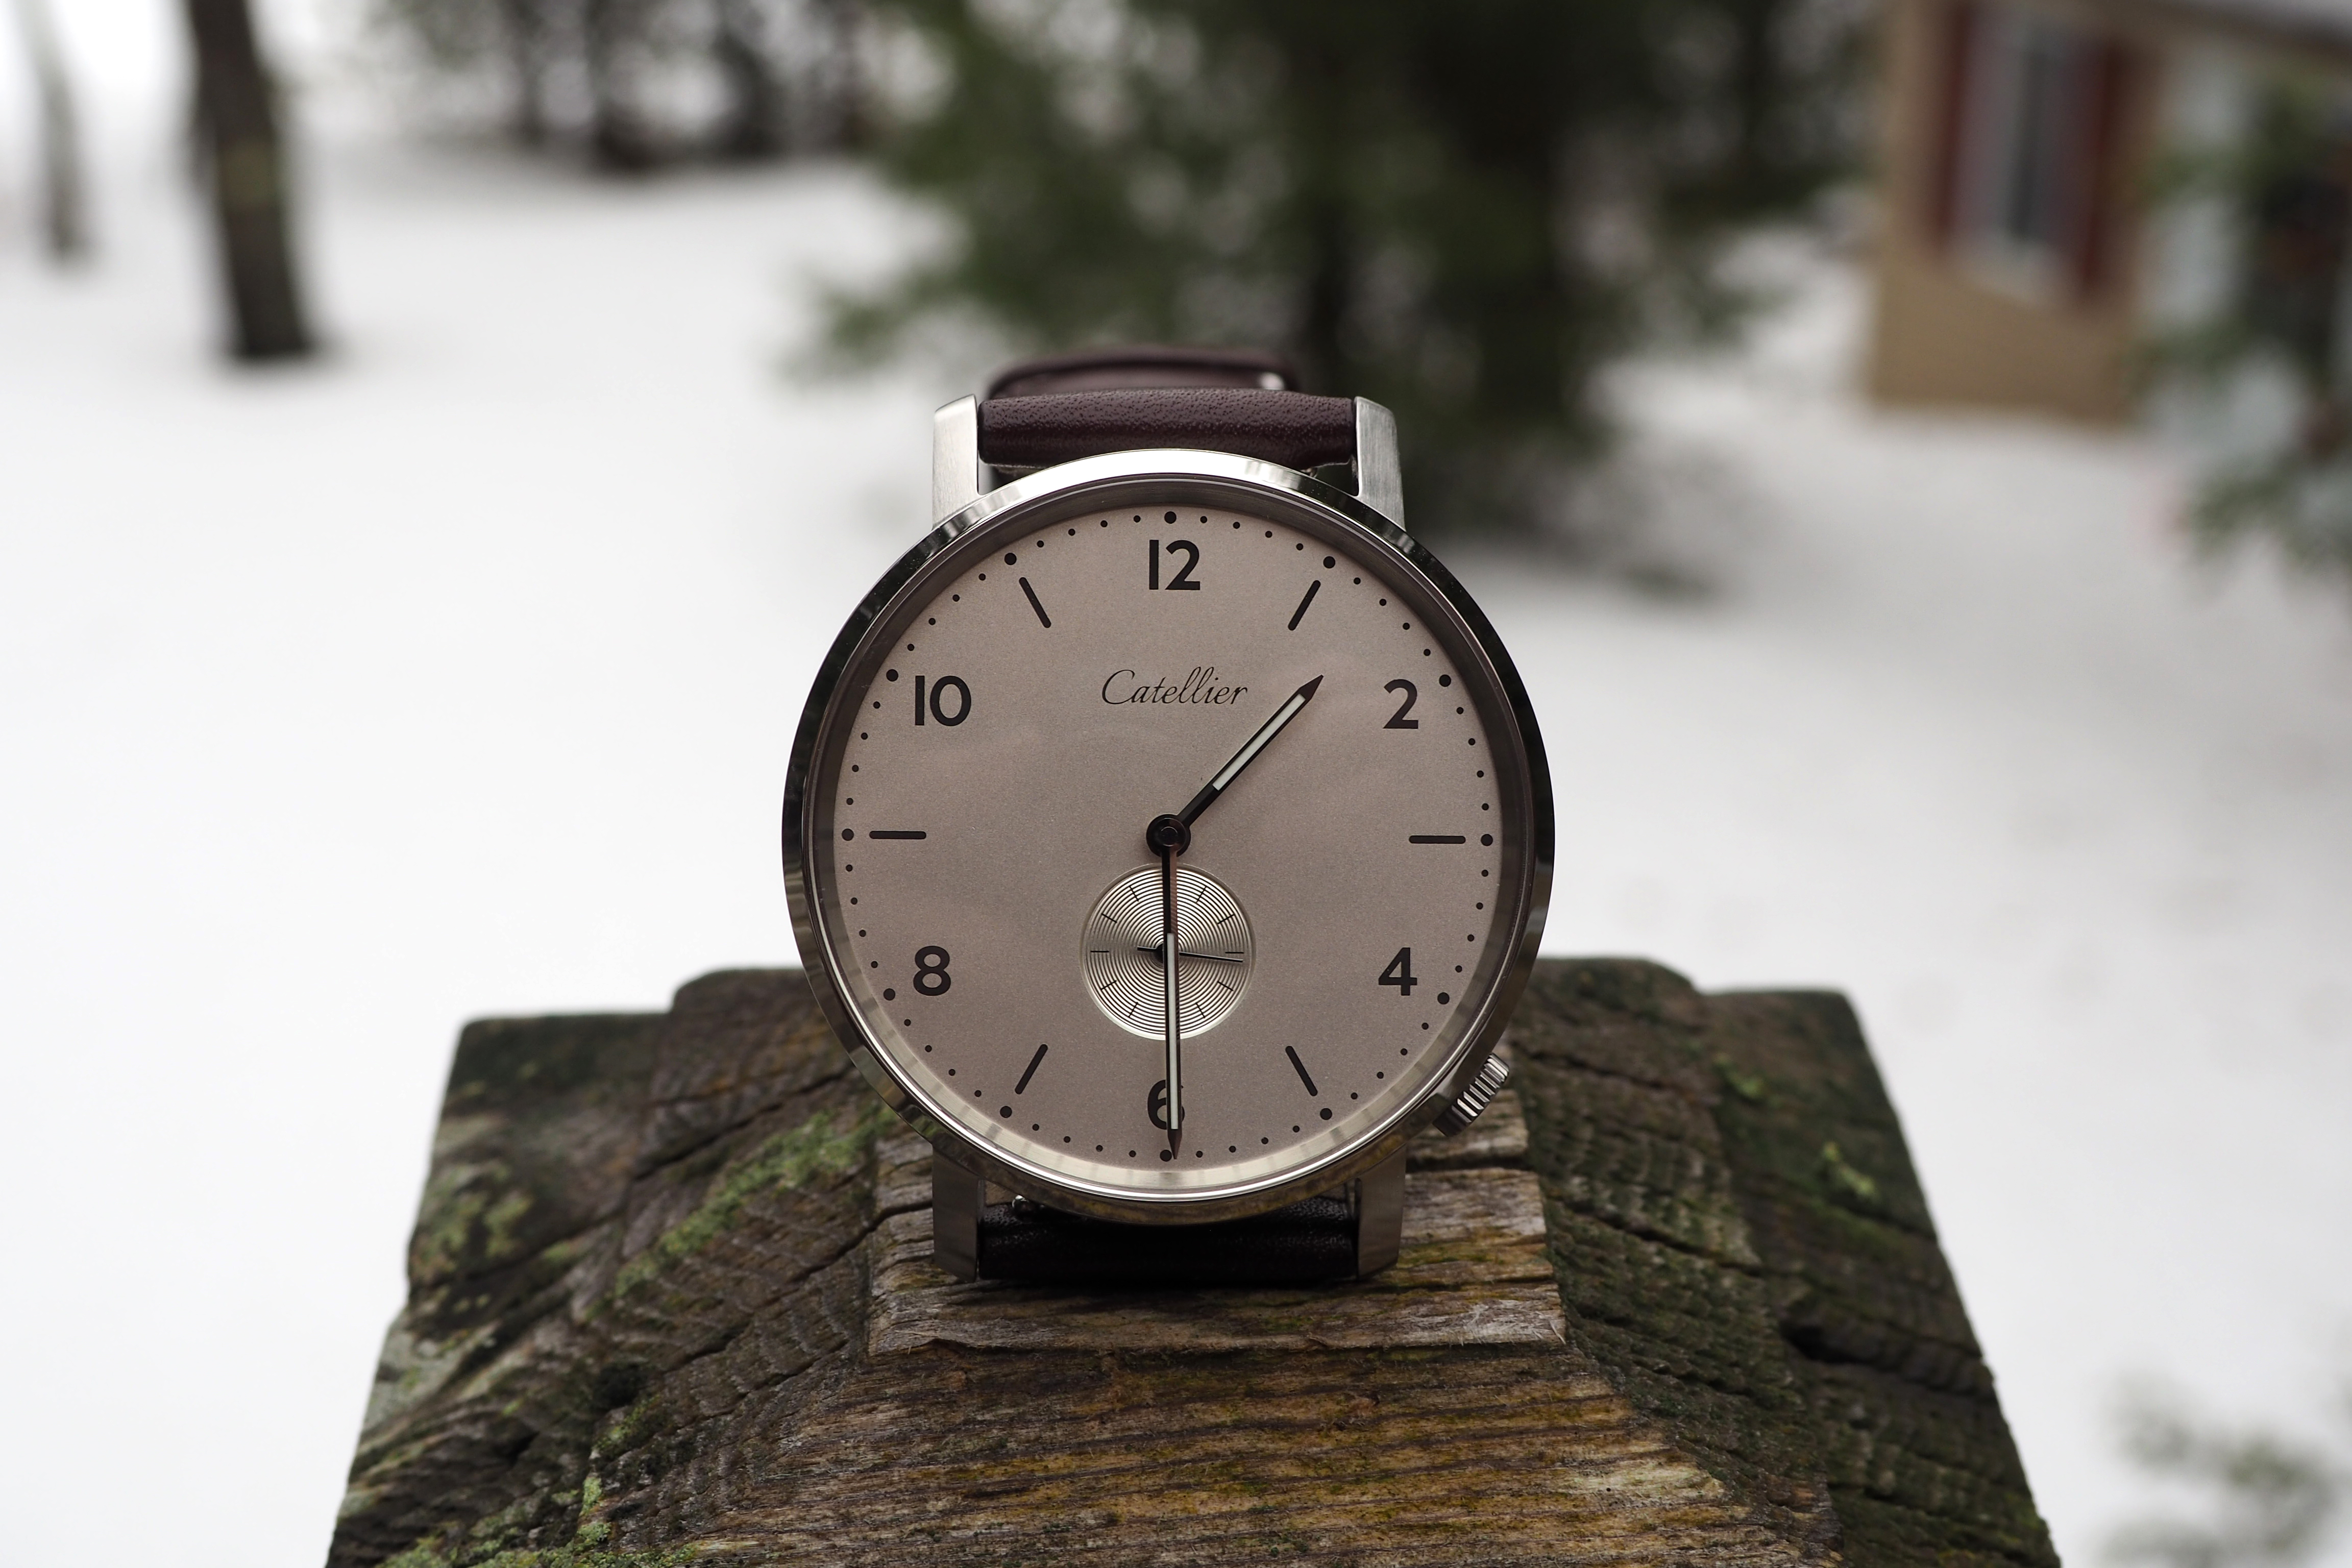 Eoniq Alster Custom Watch Review